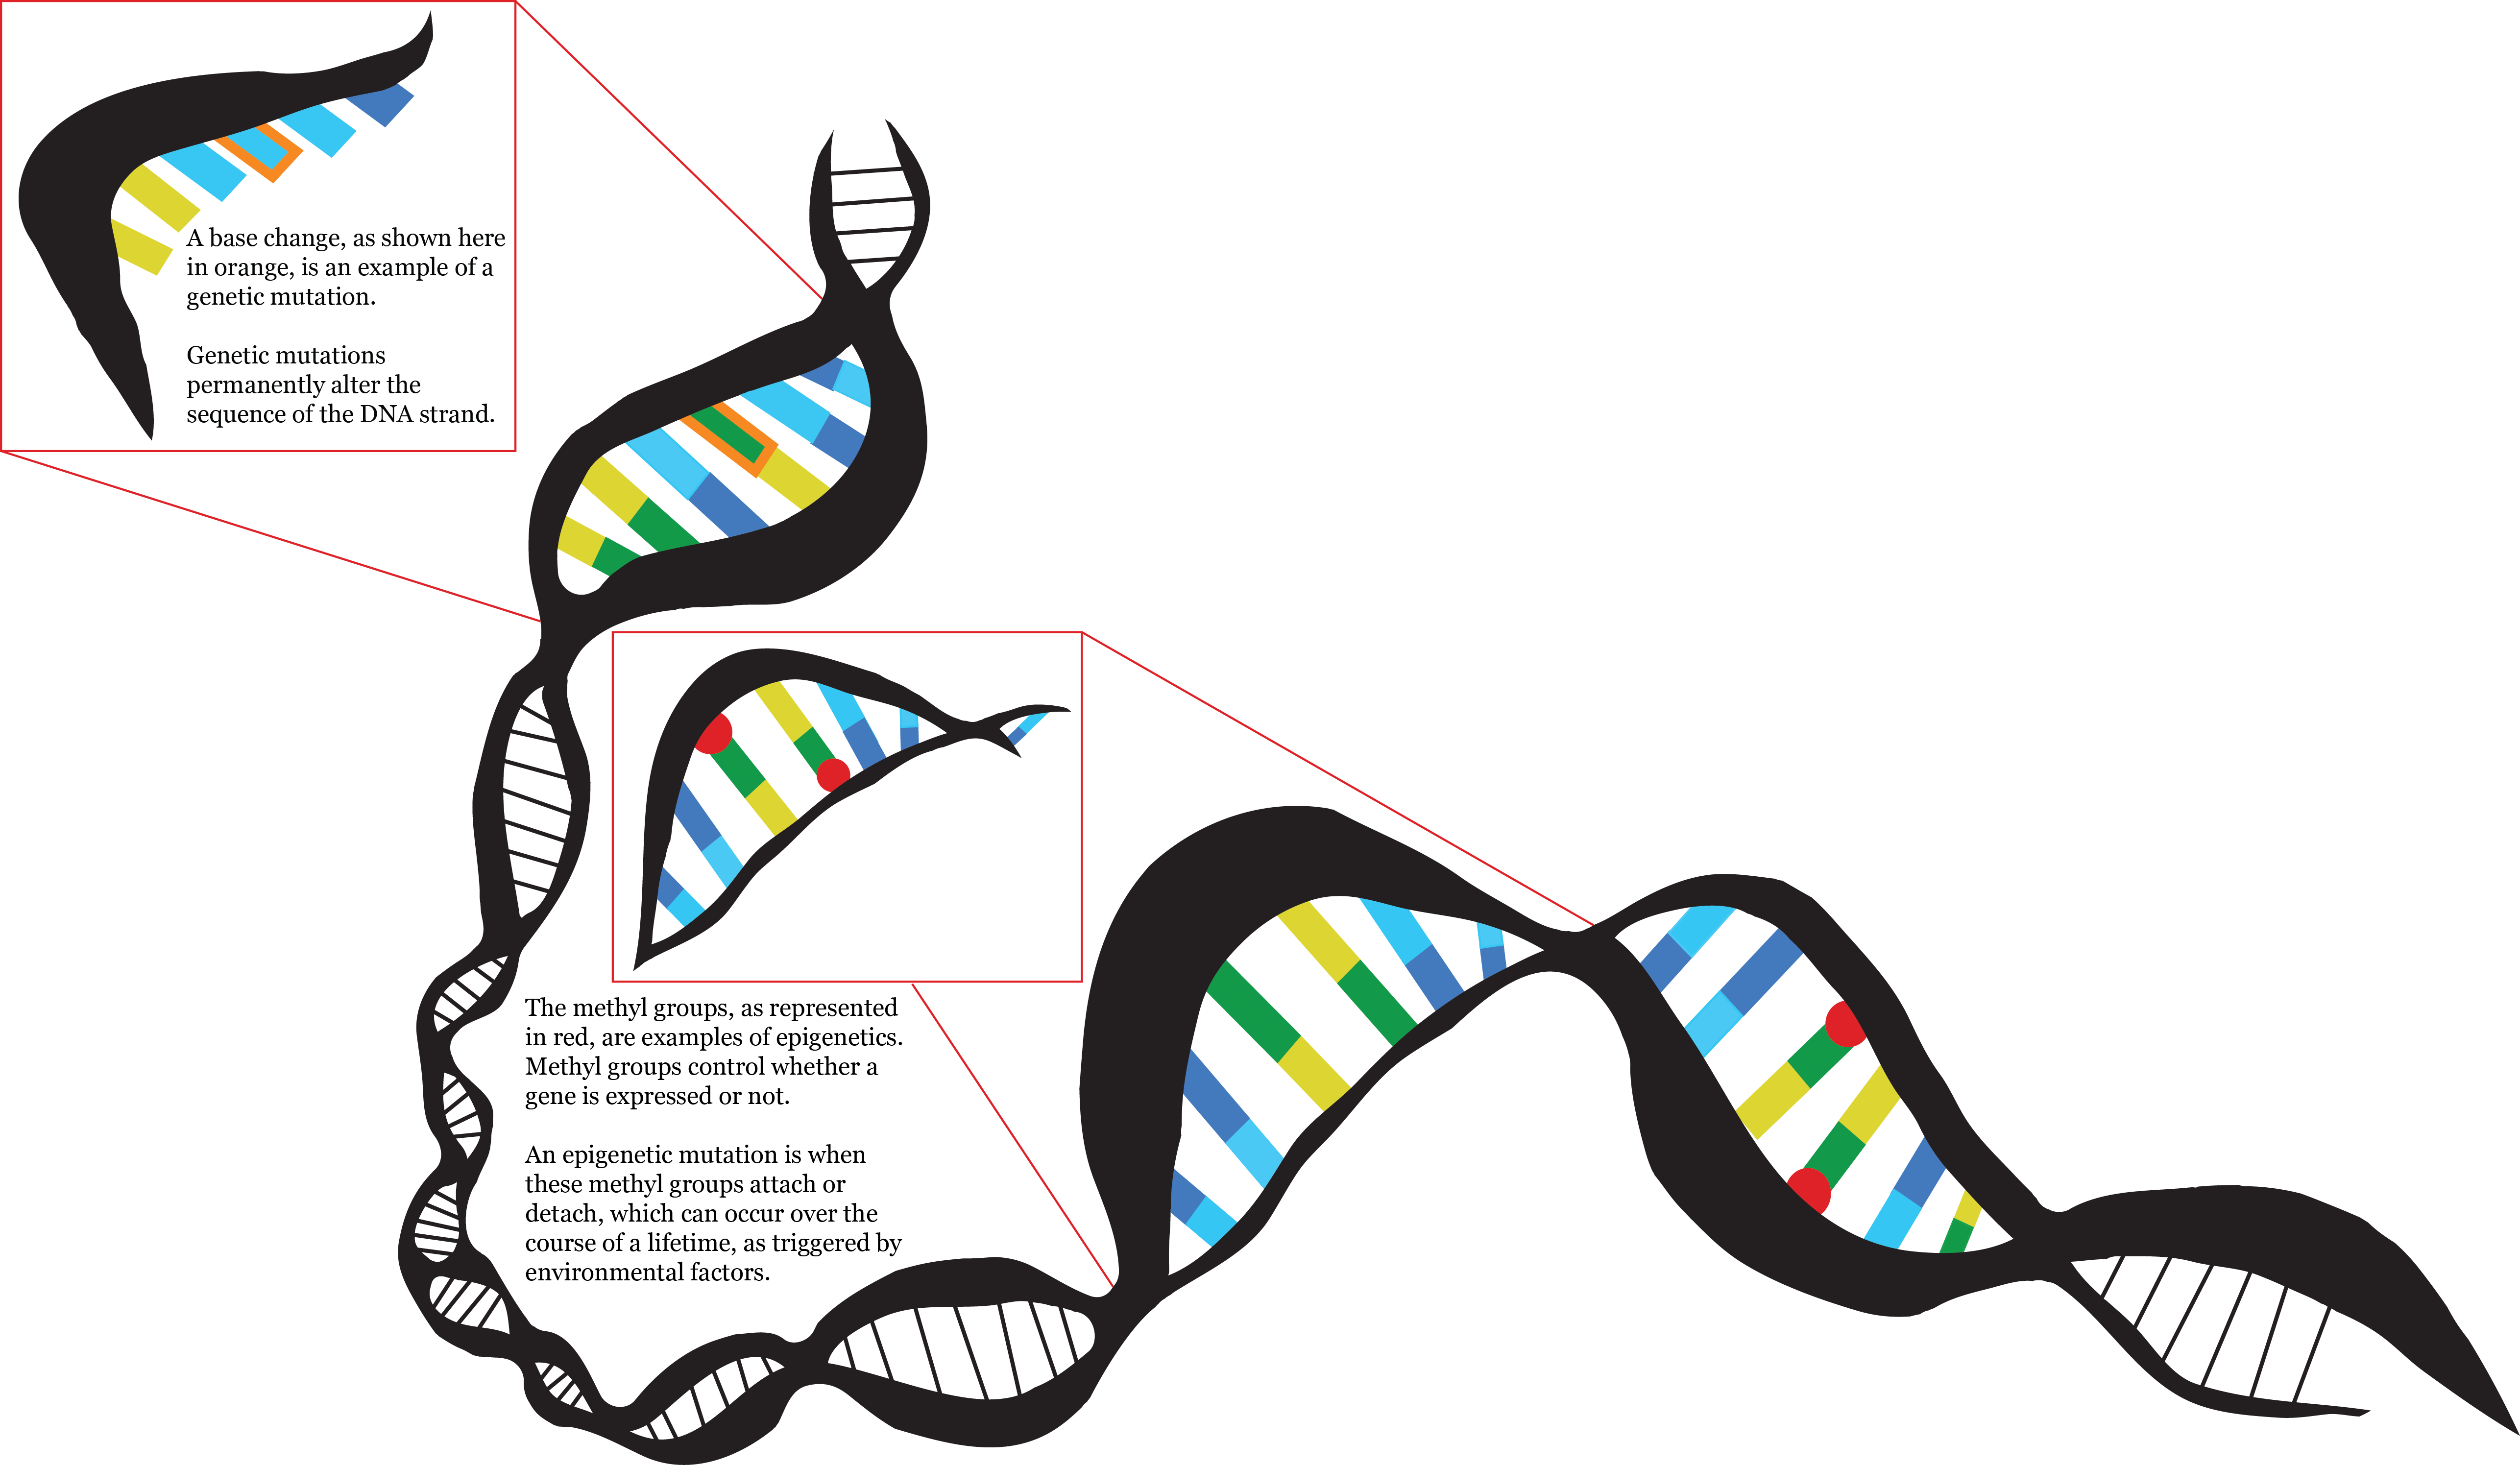 Dna clipart epigenetics. Infographics taylor malottki this